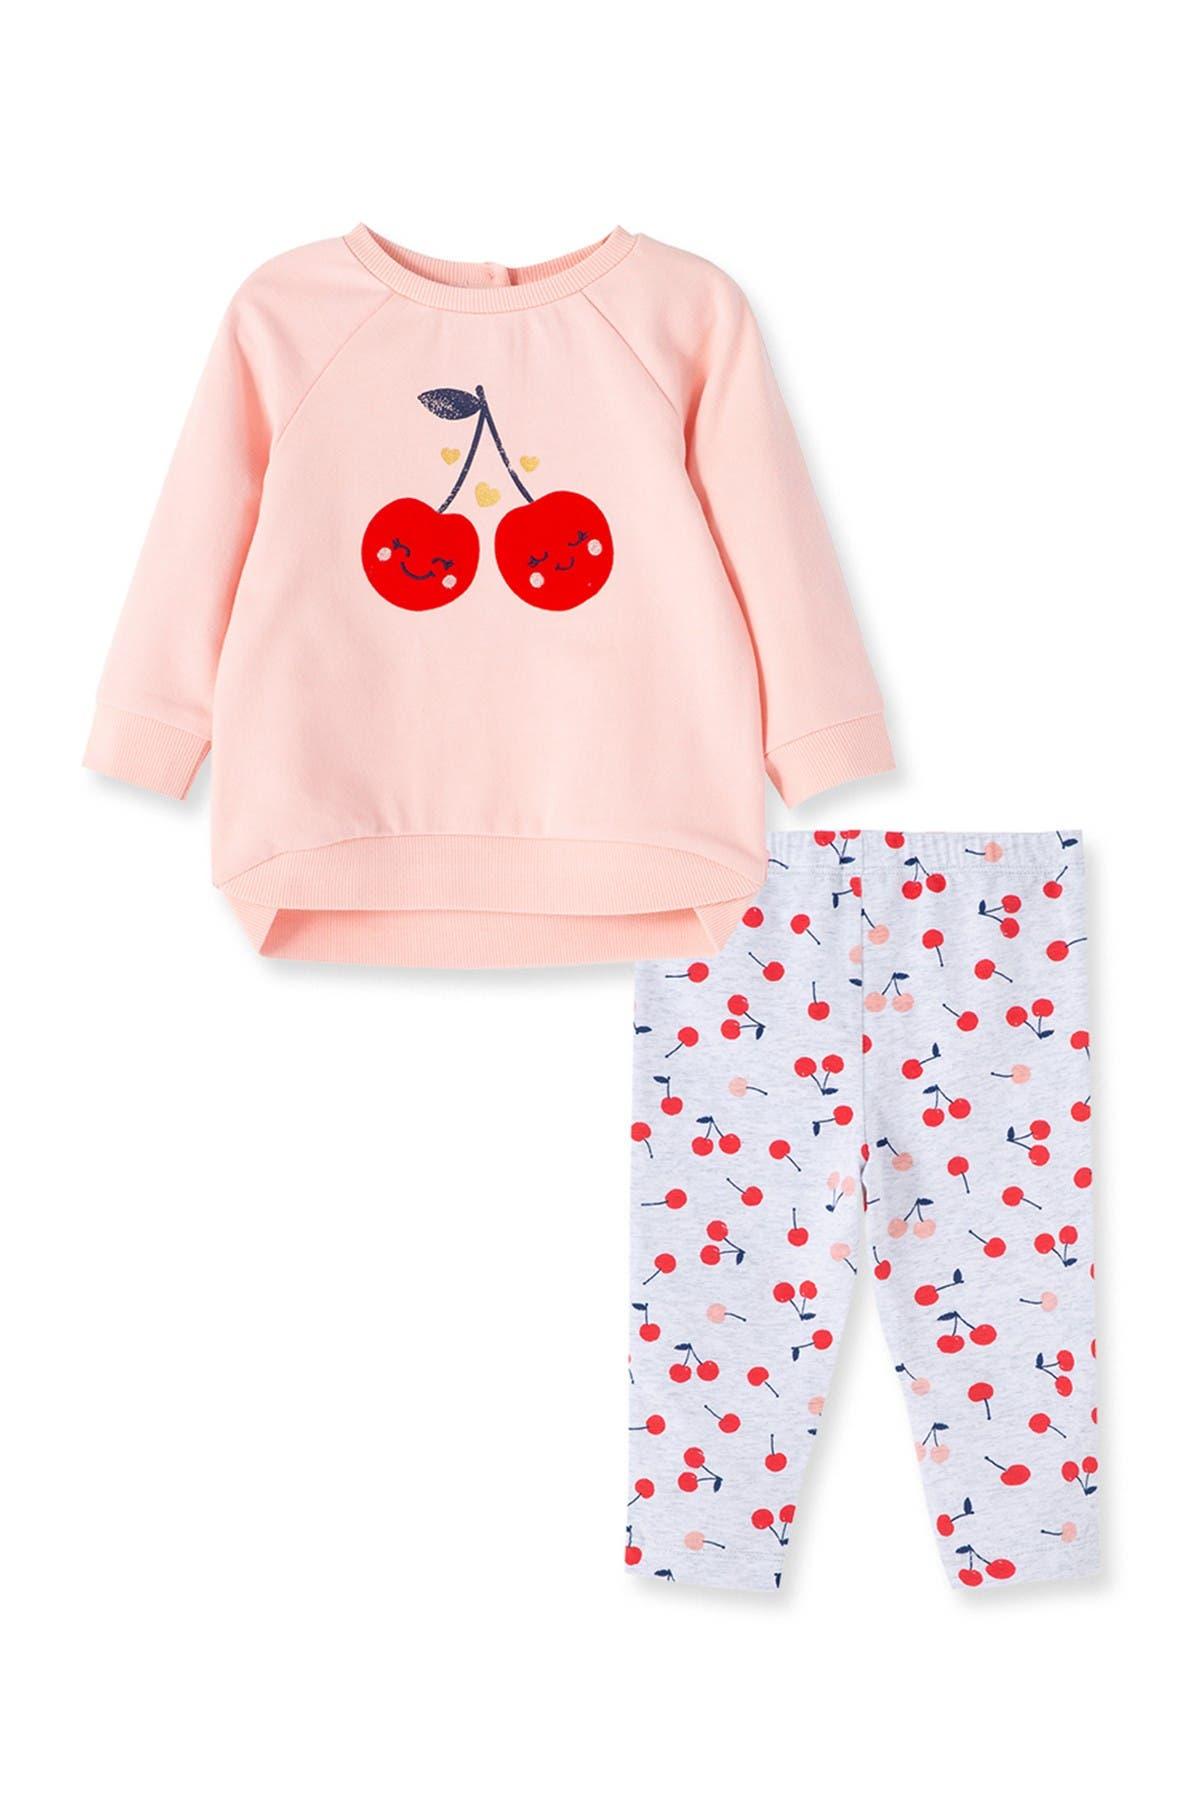 Image of Little Me Cherry 2 Piece Sweatshirt Set